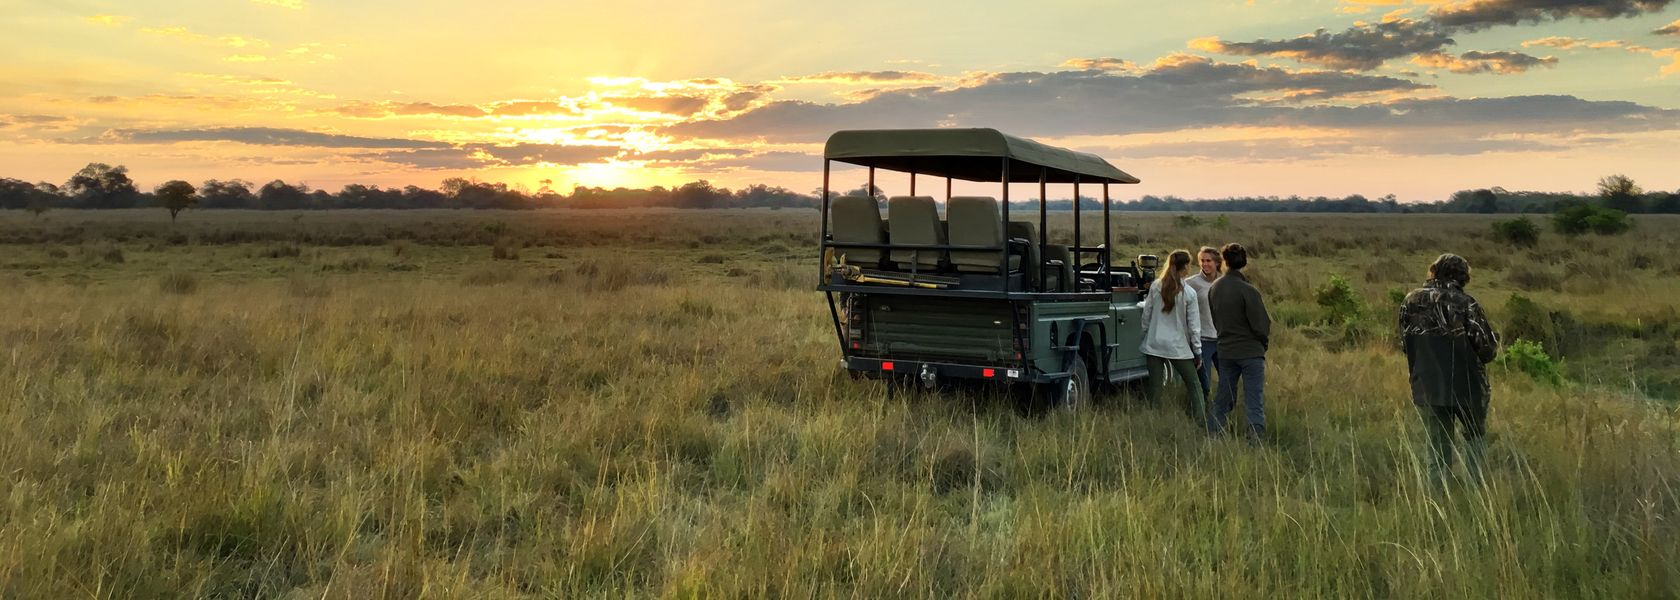 Vervoer in Zambia | Matoke Tours